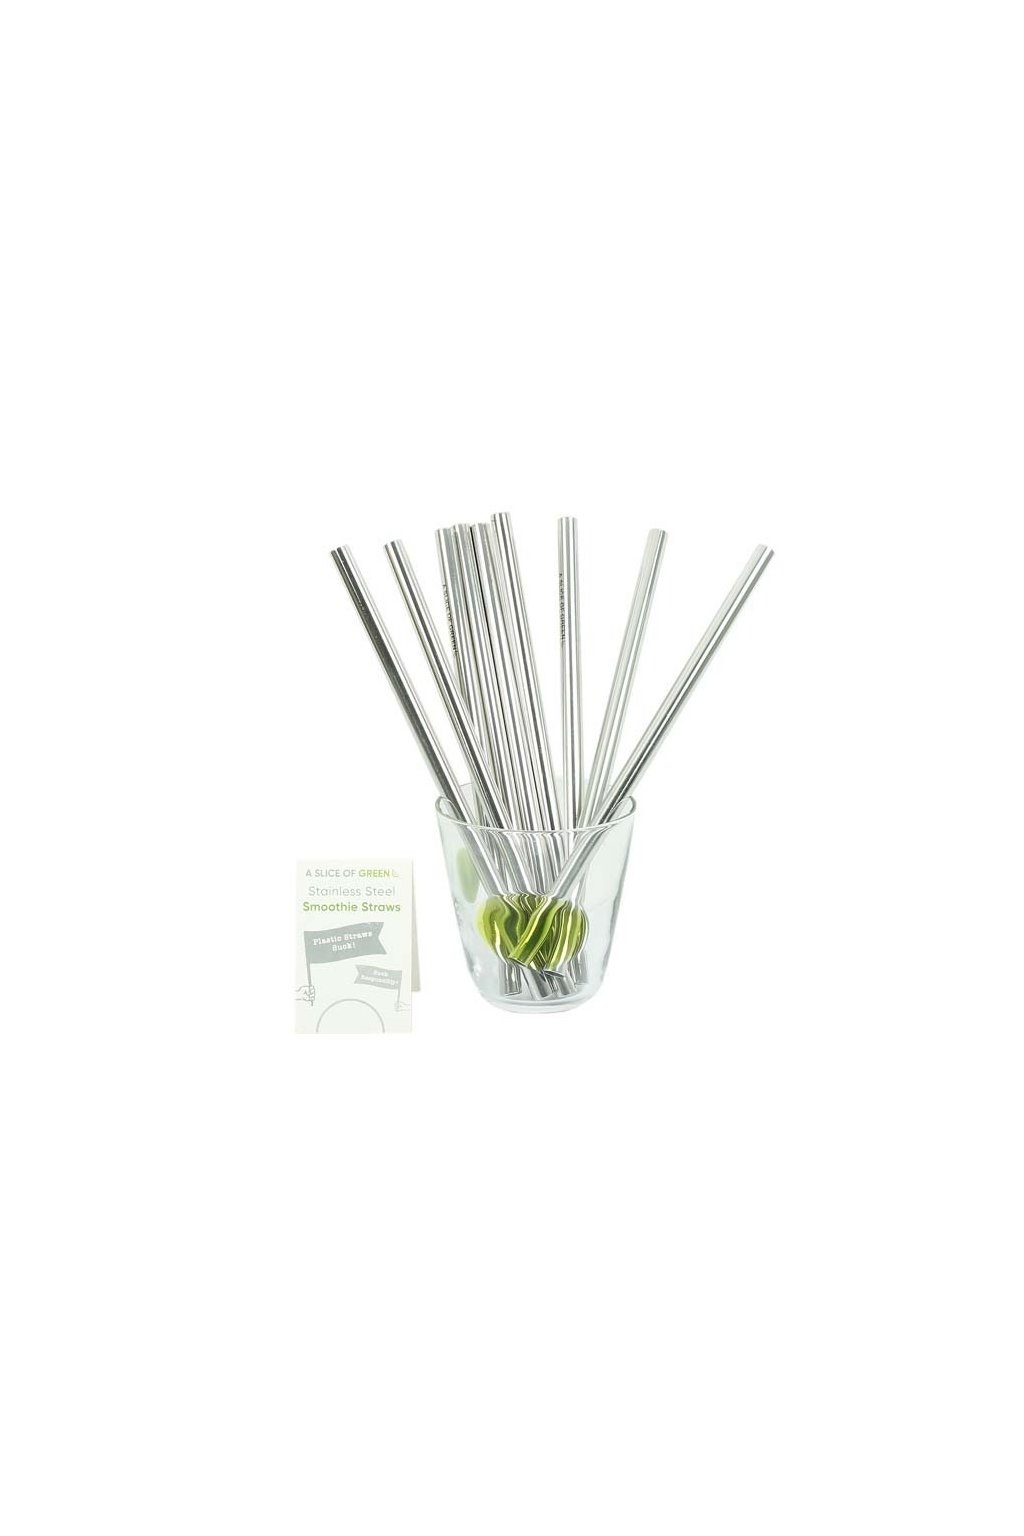 stainless steel smoothie straws bulk1